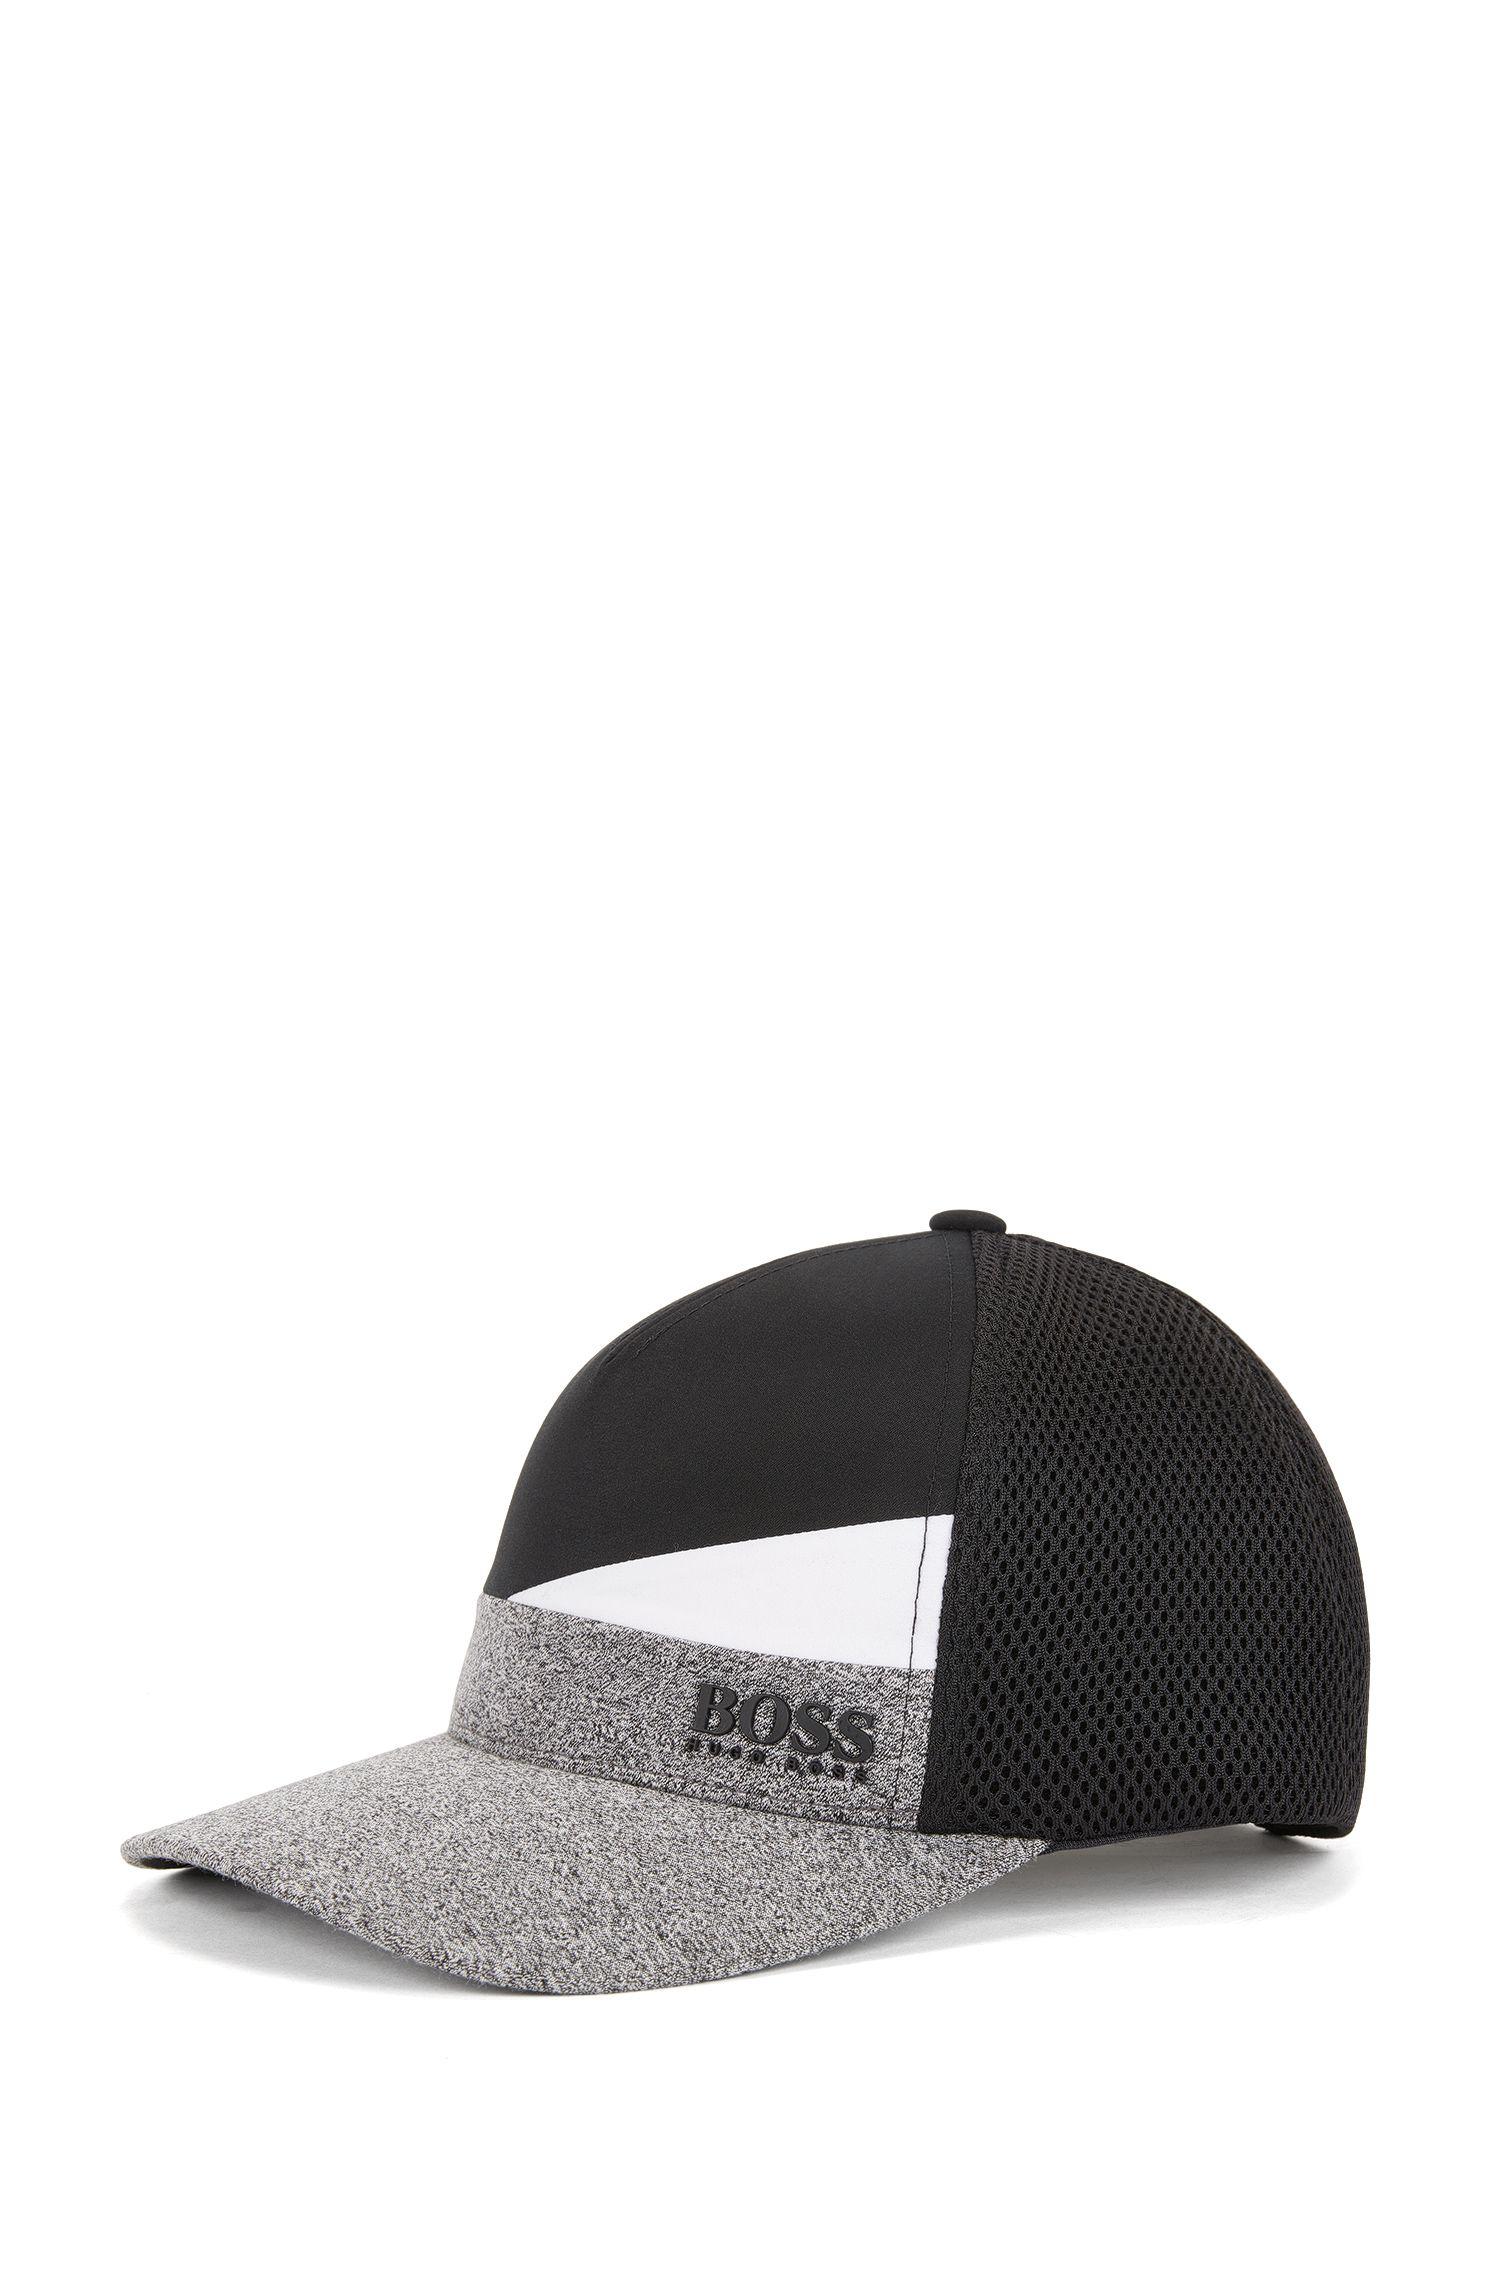 Woven Baseball Cap   Printcap